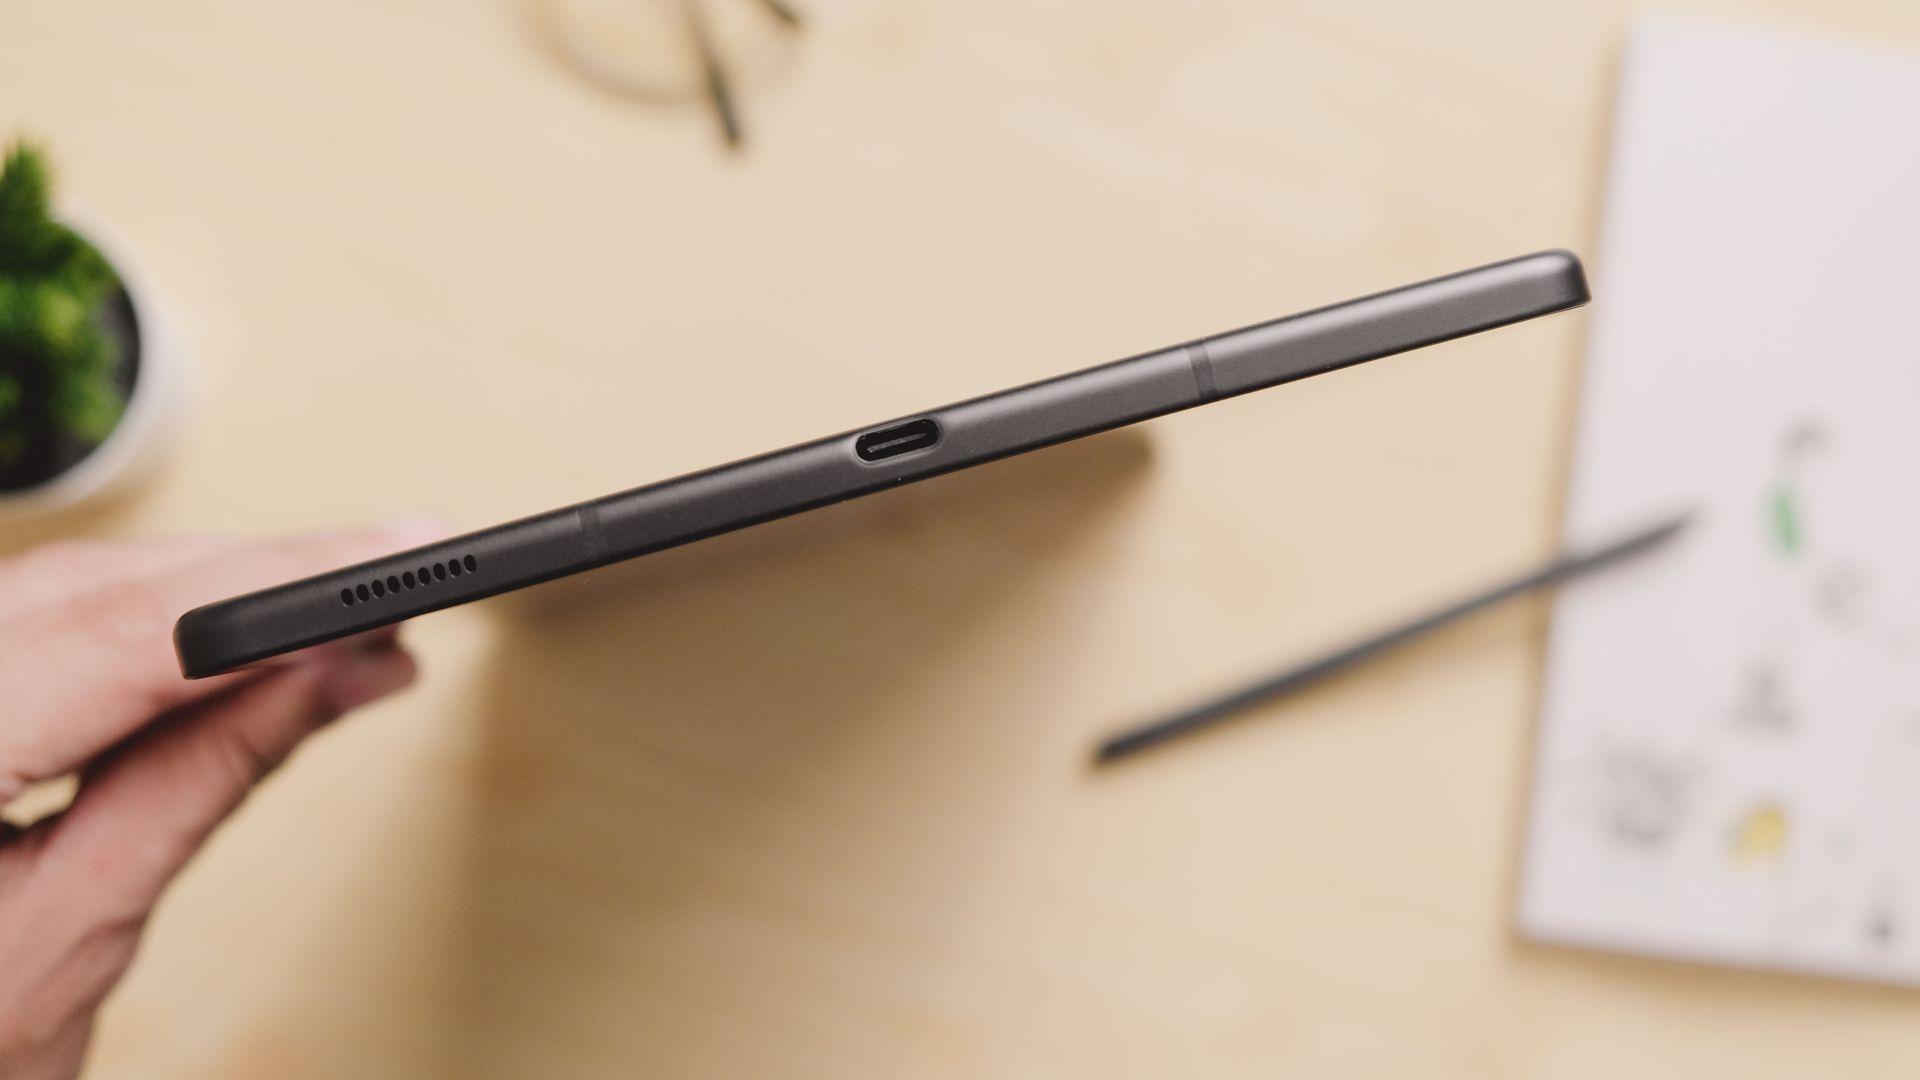 Entrada USB-C do Galaxy Tab S6 Lite. (Imagem: Framesira/Shutterstock)